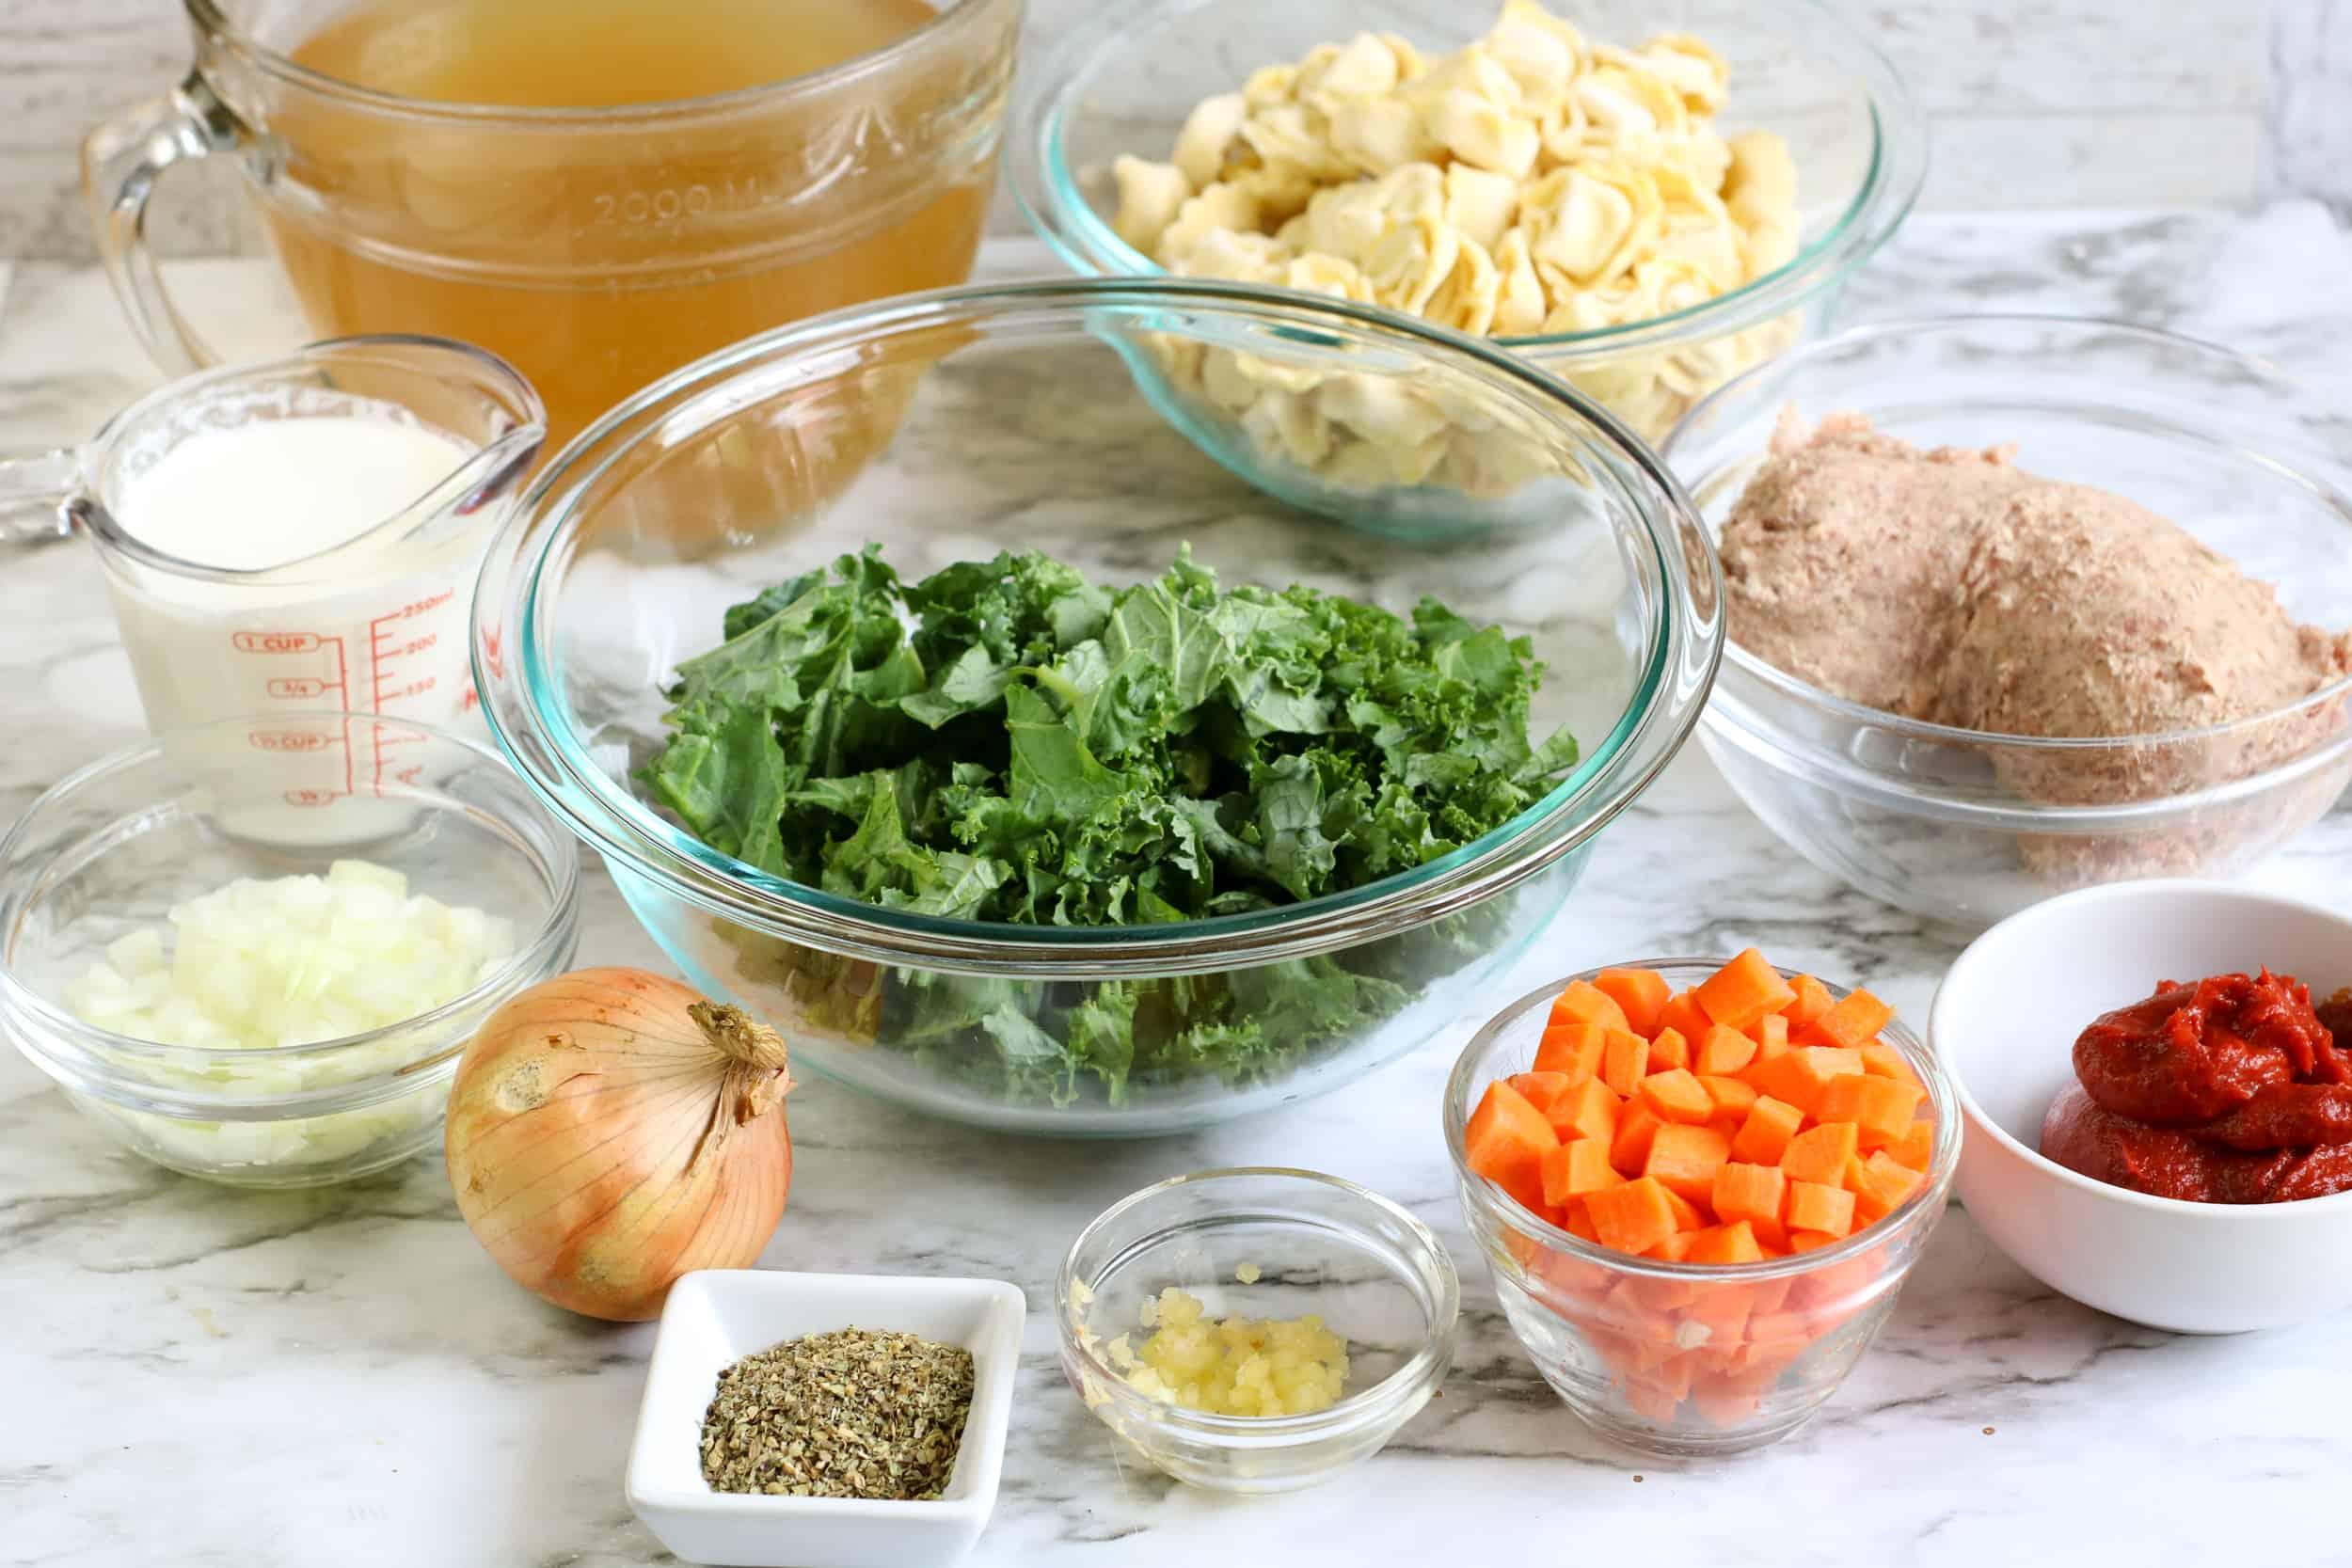 Ingredients for Pork Sausage Tortellini Soup